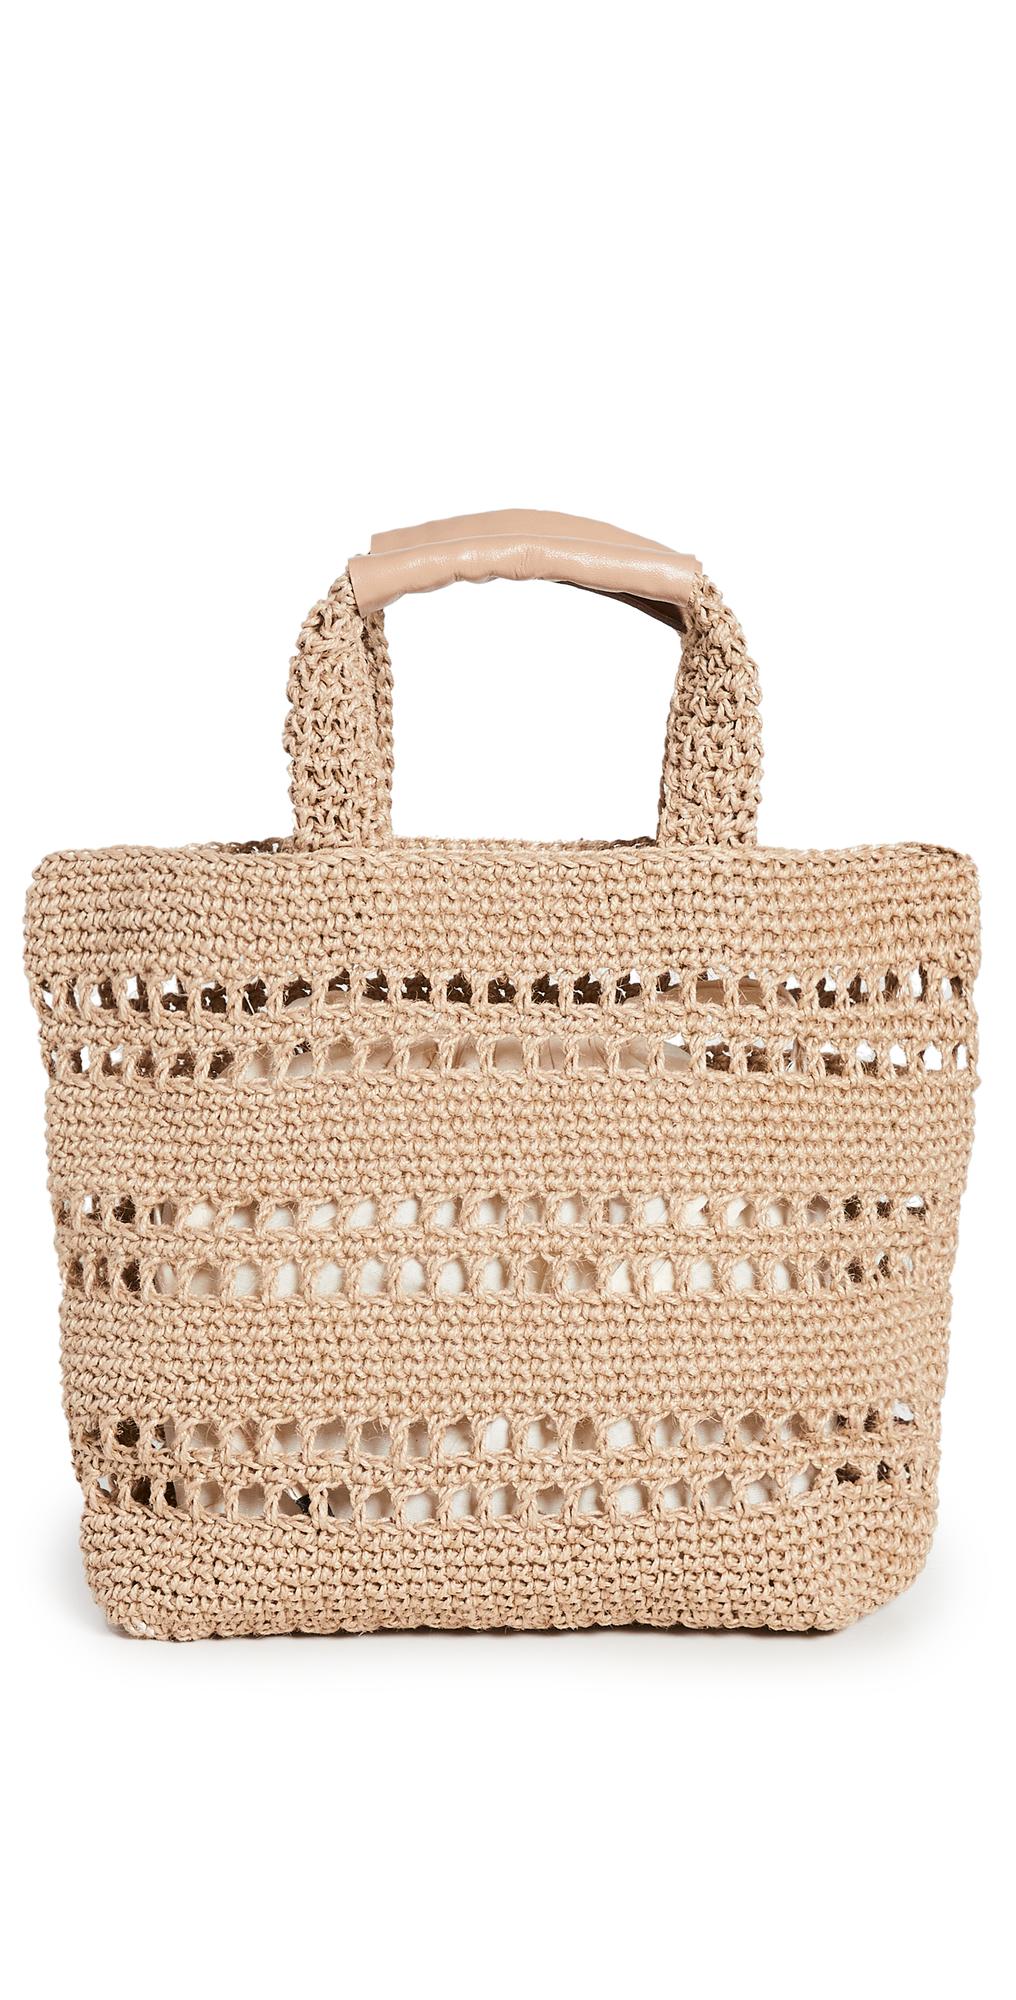 Nannacay Cilbene Bag